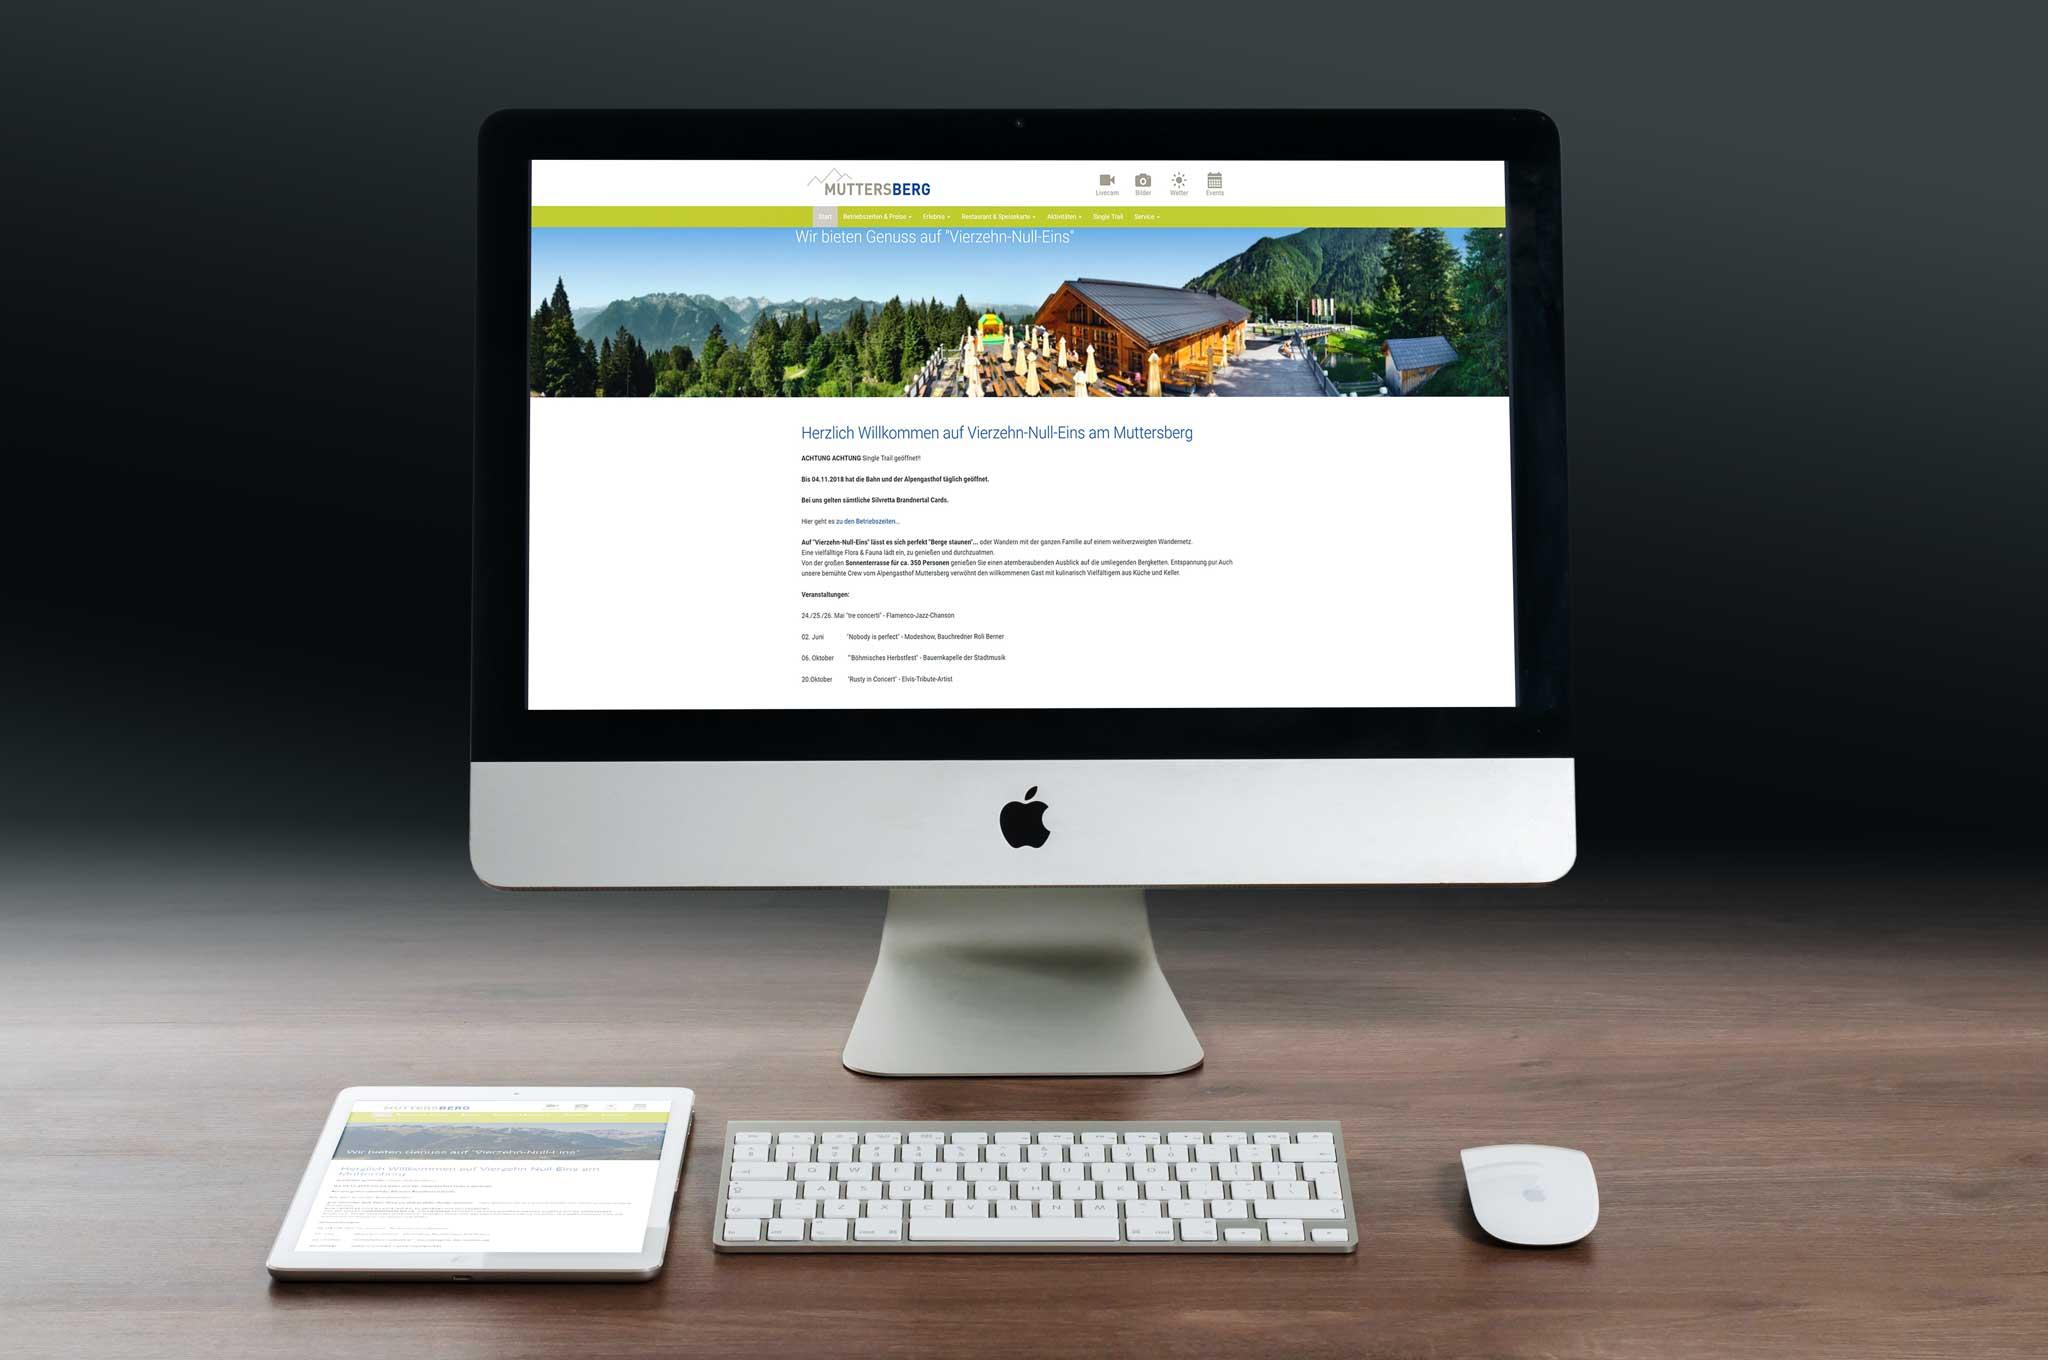 Muttersberg Bergbahnen und Alpengasthof Homepage